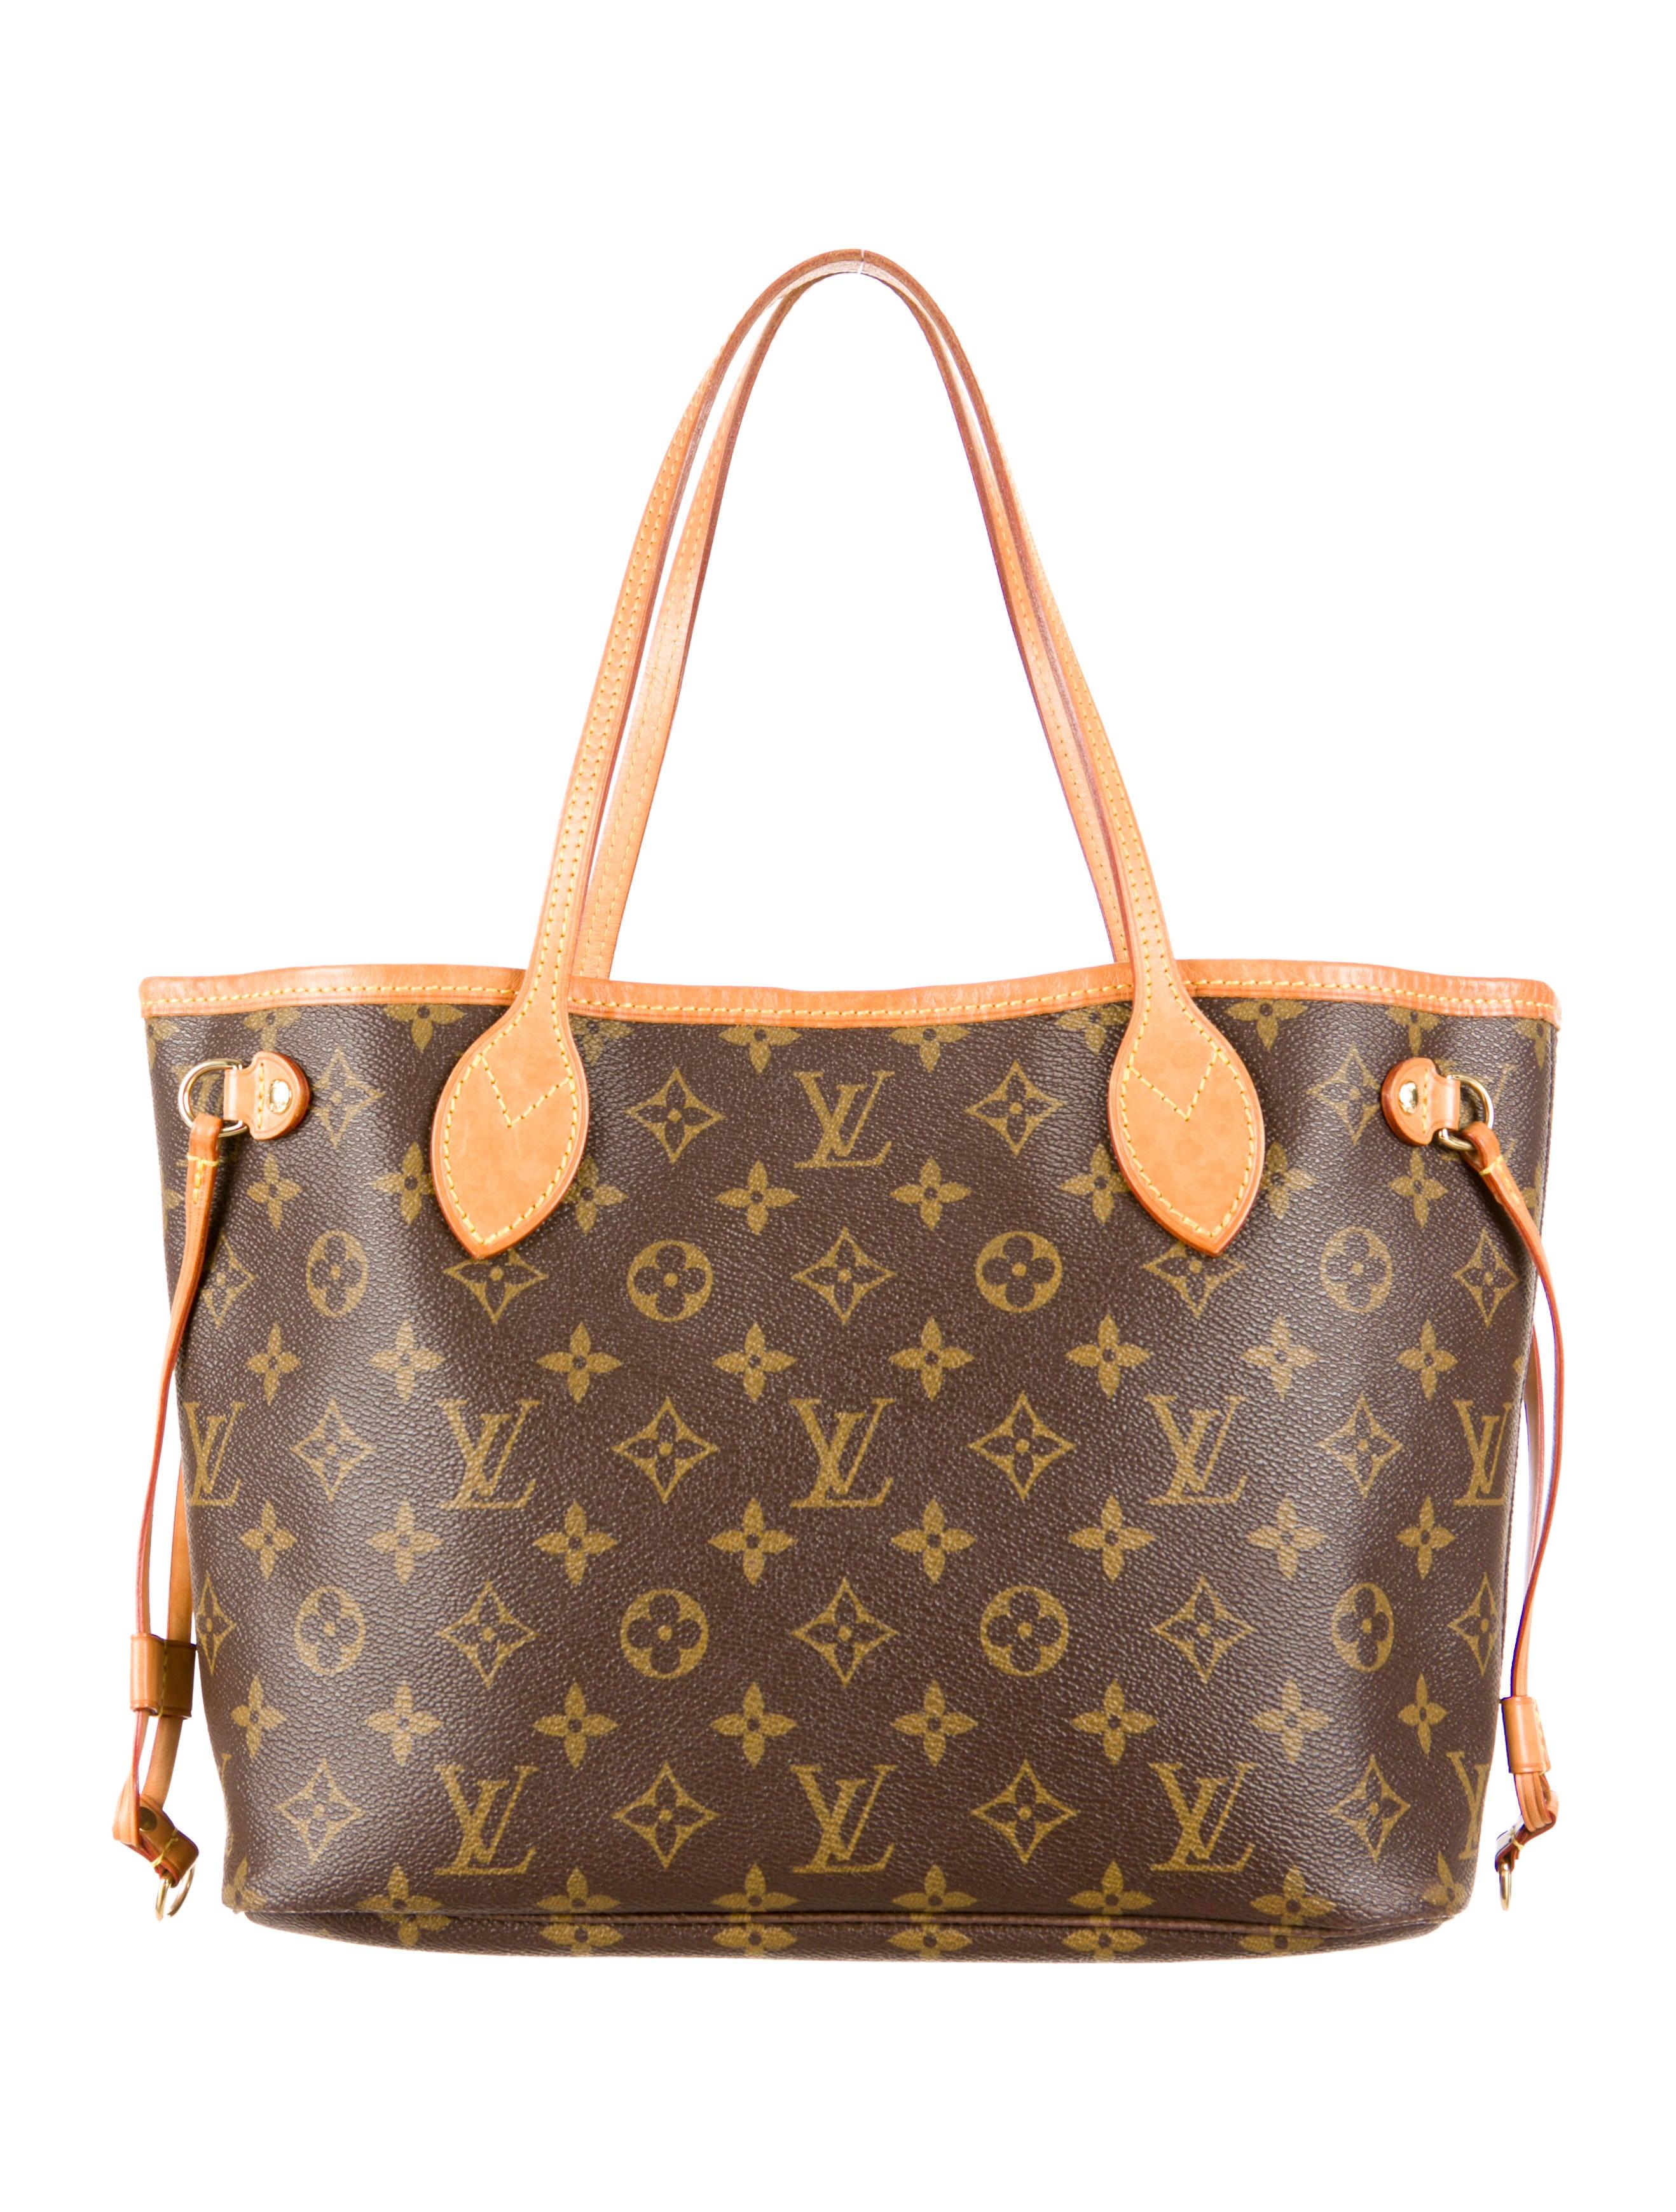 Louis Vuitton Neverfull PM - Handbags - LOU47446   The ...